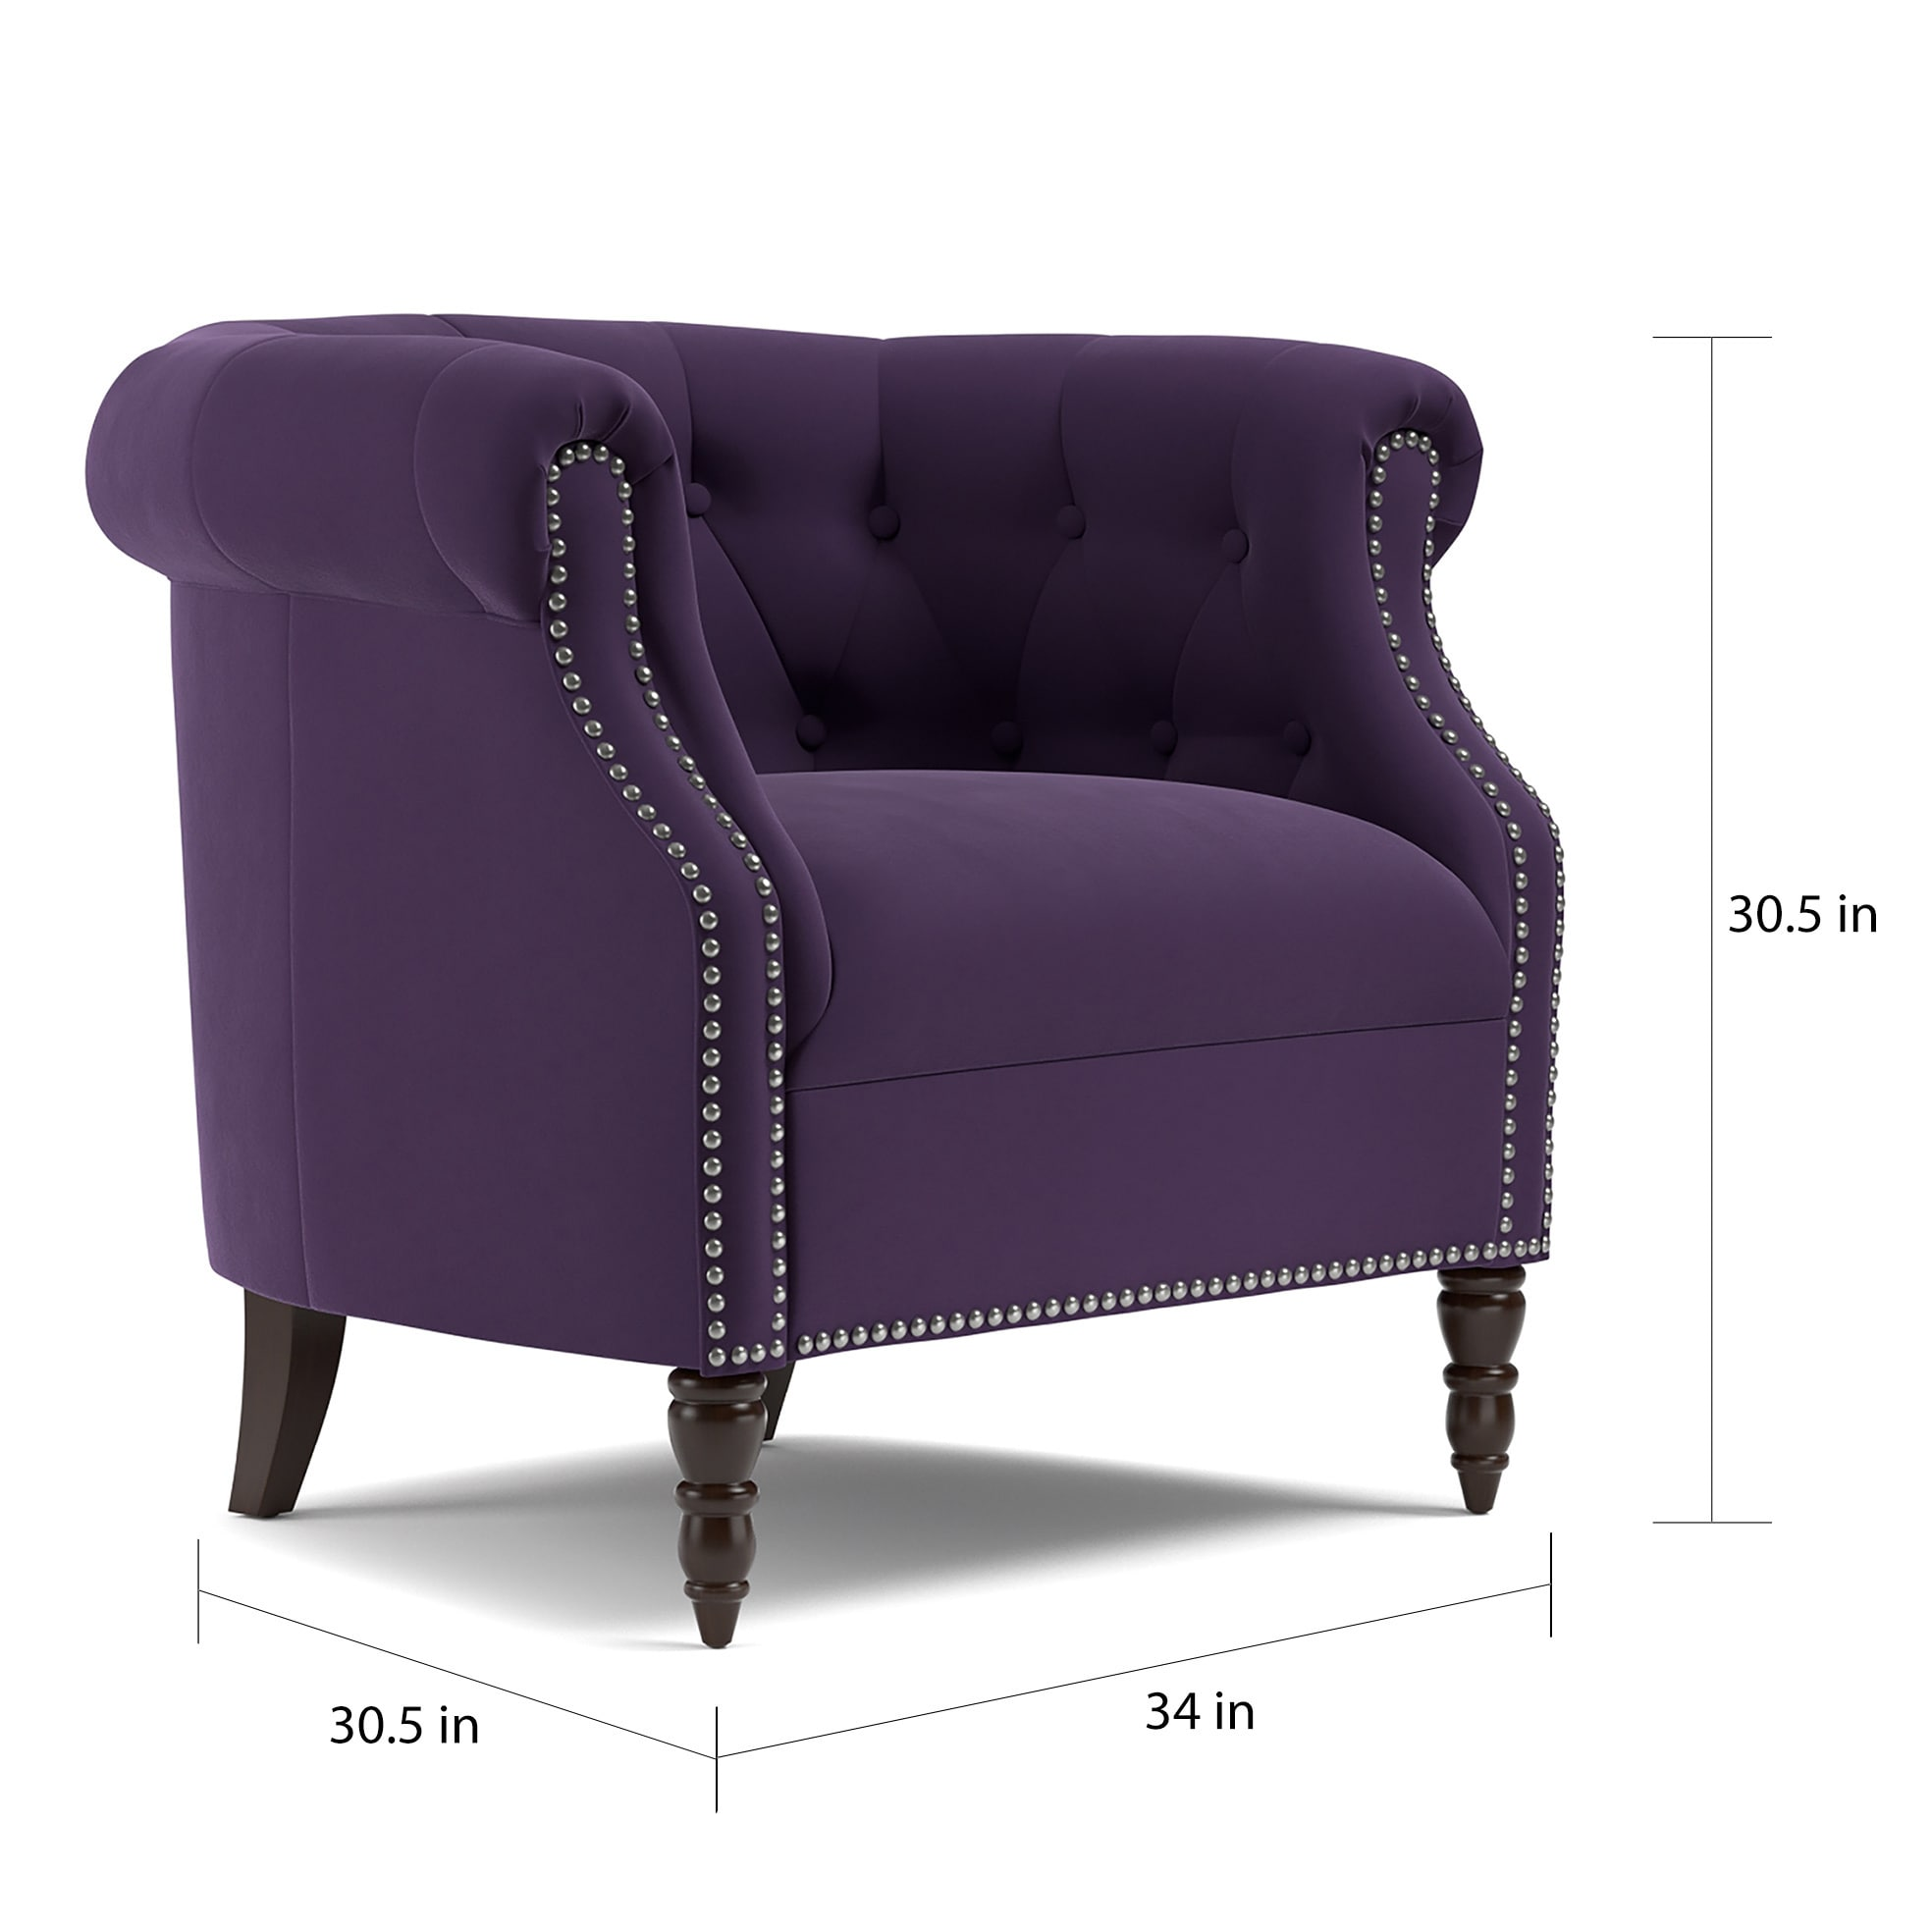 Peachy Copper Grove Muir Chesterfield Plum Purple Velvet Arm Chair Beatyapartments Chair Design Images Beatyapartmentscom